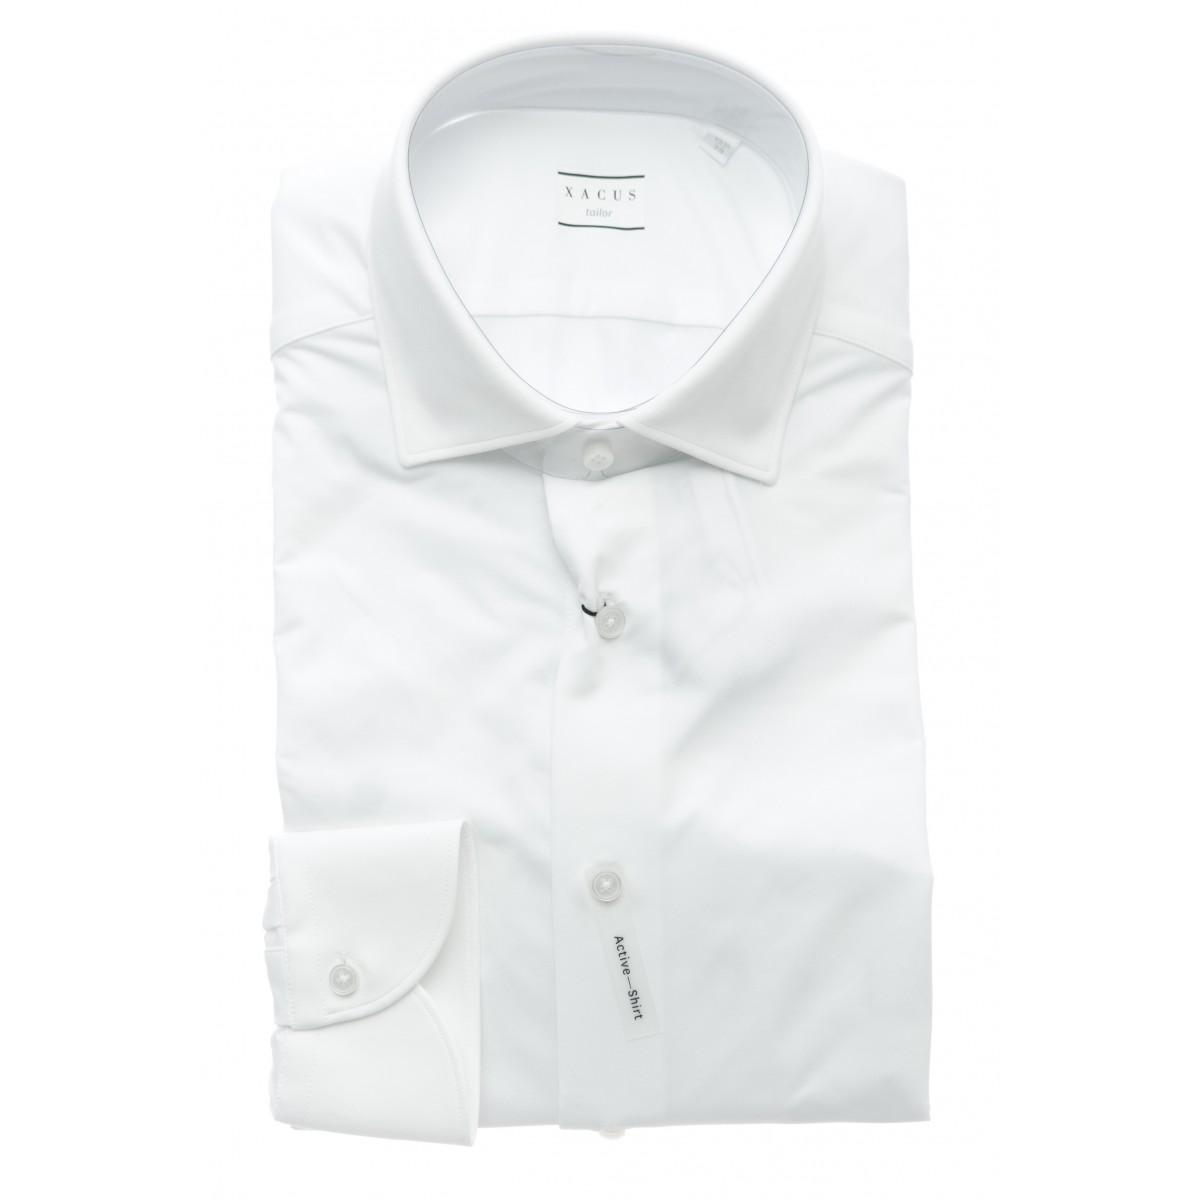 Camicia uomo - 558 11460 active